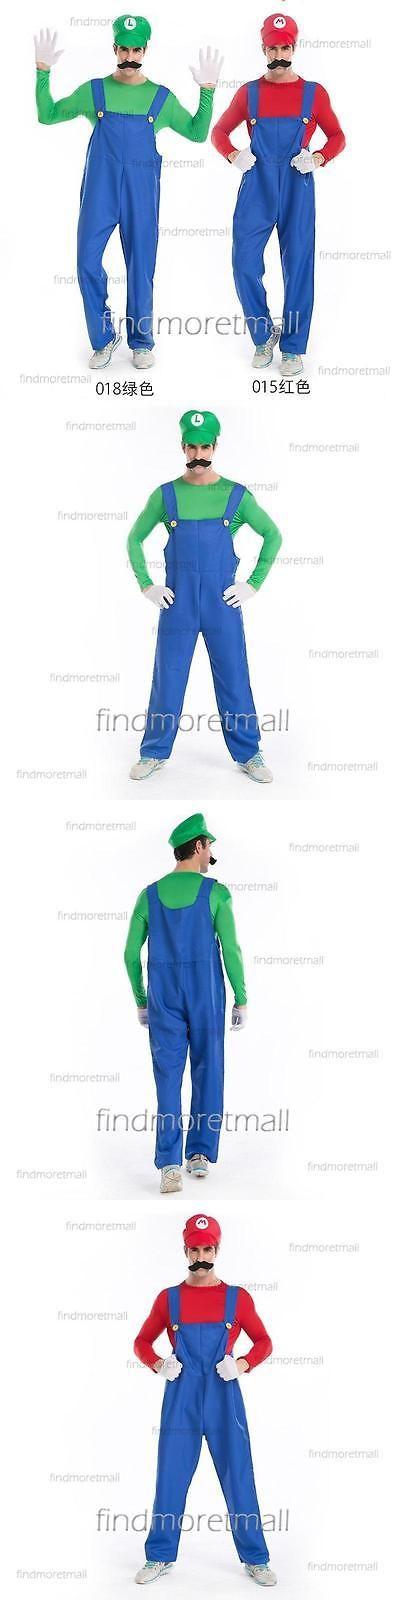 Halloween Costumes: Adult Mens Super Mario And Luigi Workmen Couples Halloween Fancy Xmas Costumes BUY IT NOW ONLY: $17.99